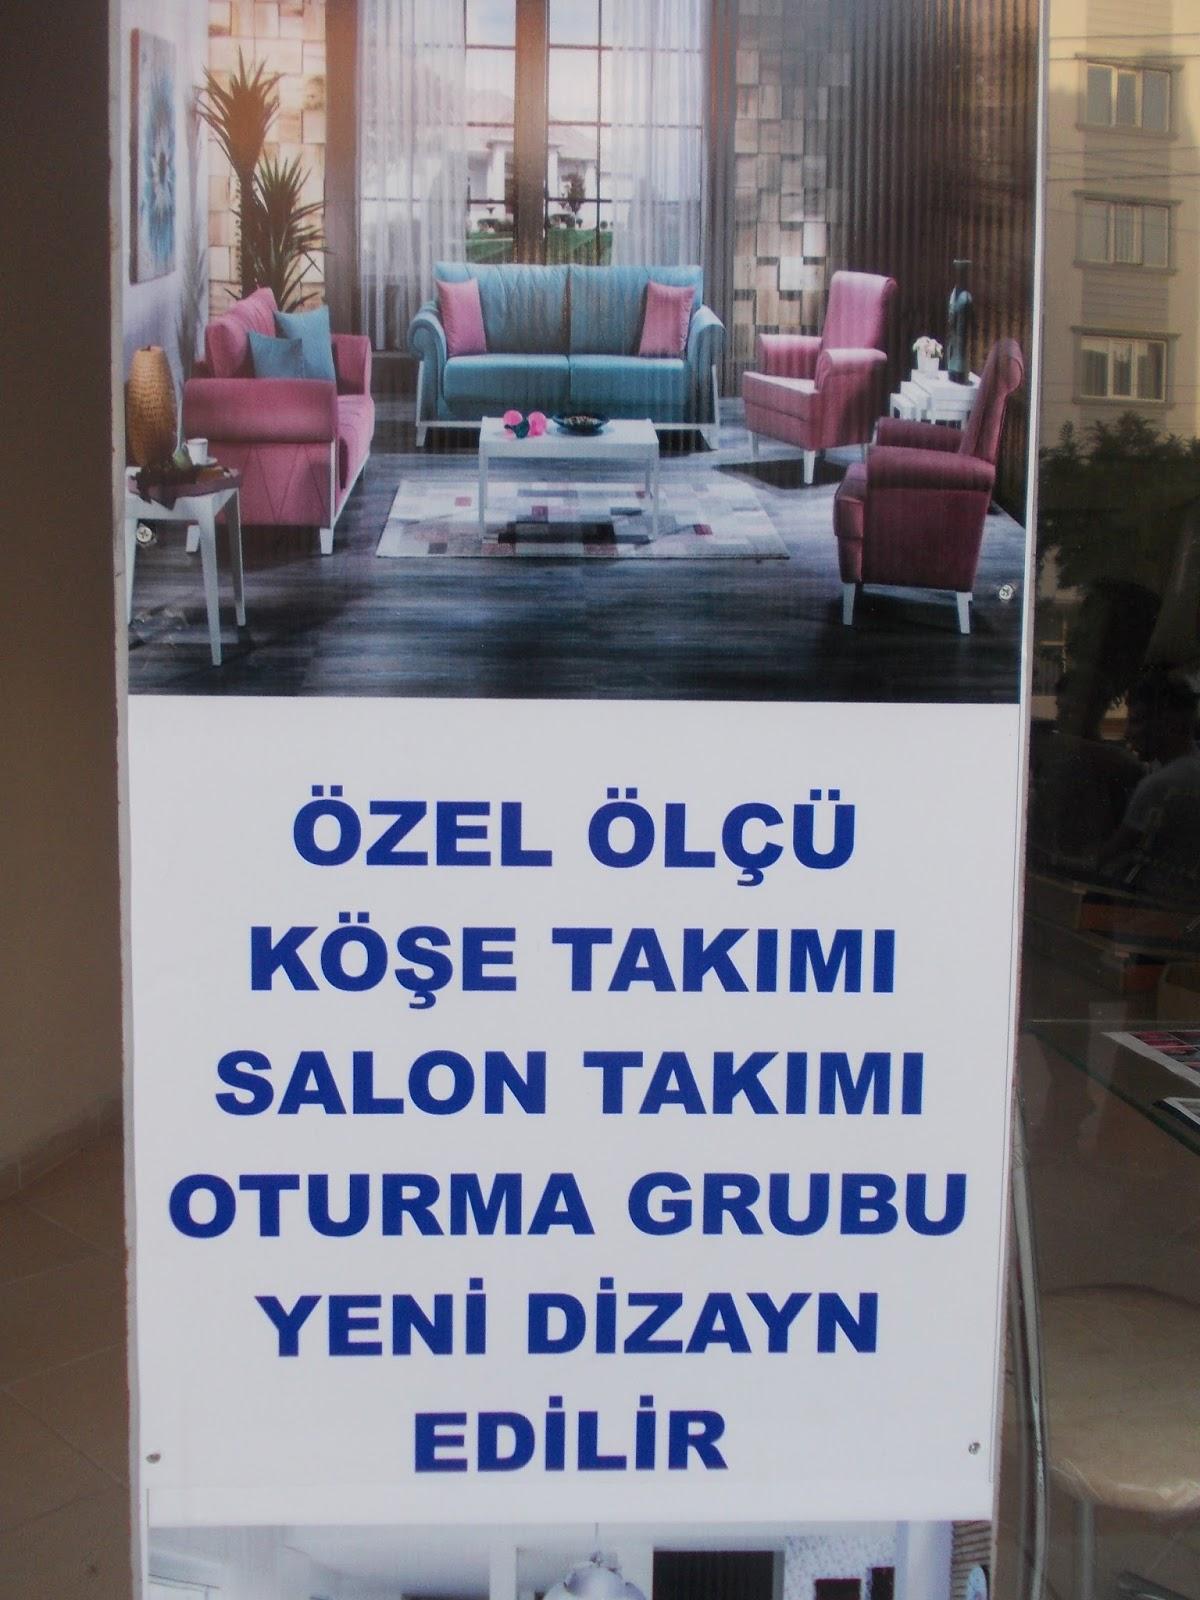 Manisa Ozel Tasarim Kose Takimi Salon Takimi Oturma Grubu